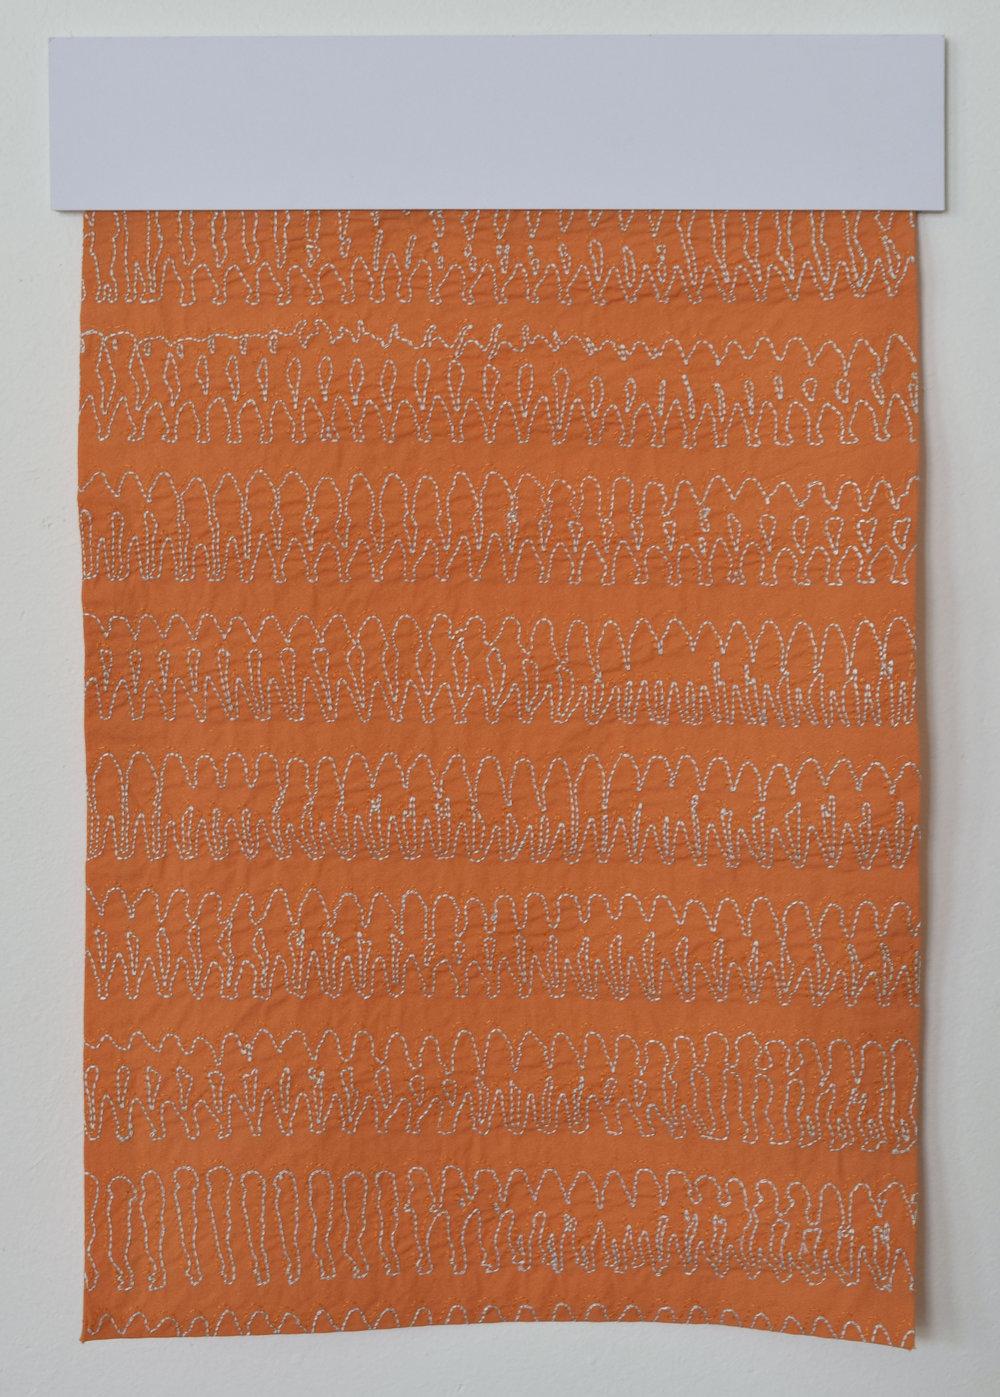 Taania,  Foundations  by Kate Nash, digital embroidery, horizontal stripe